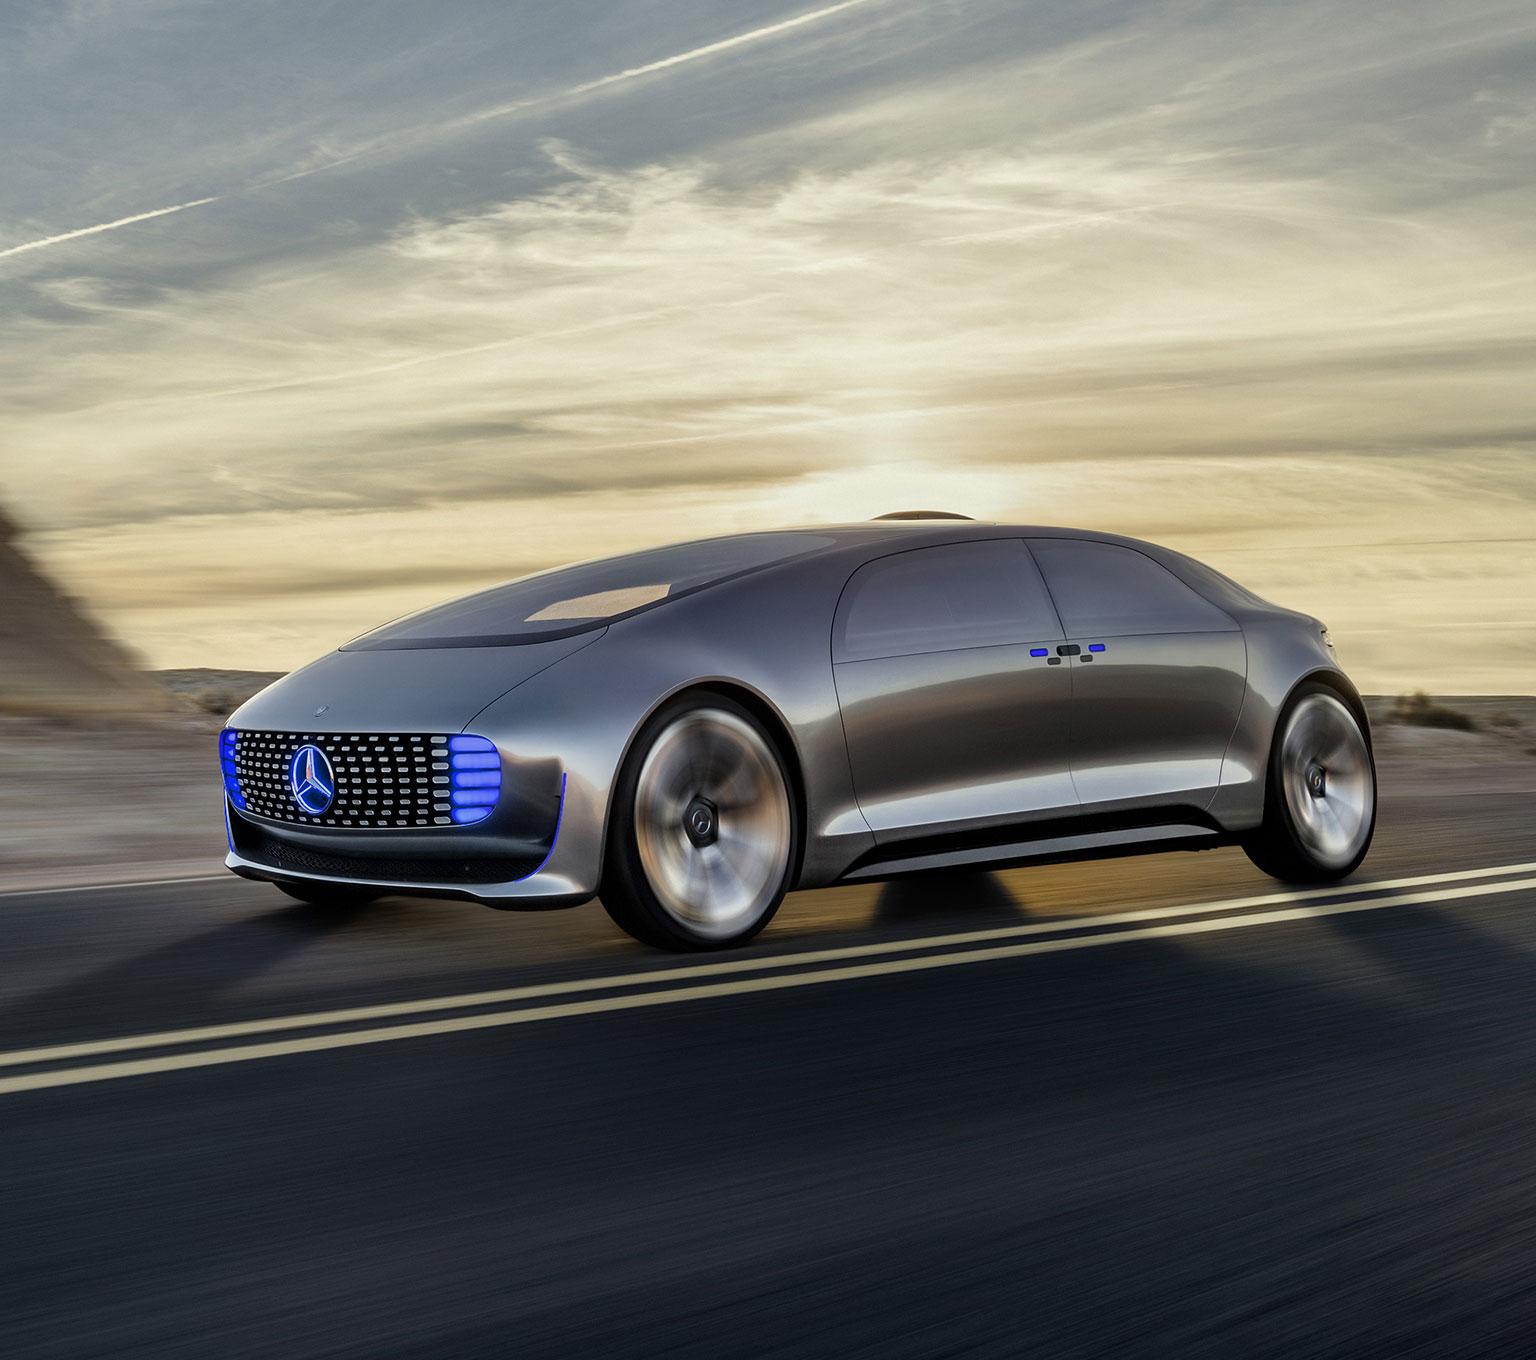 Future Interior Luxury Design: Consumers Prefer Collision-Avoiding Technology: JDPA